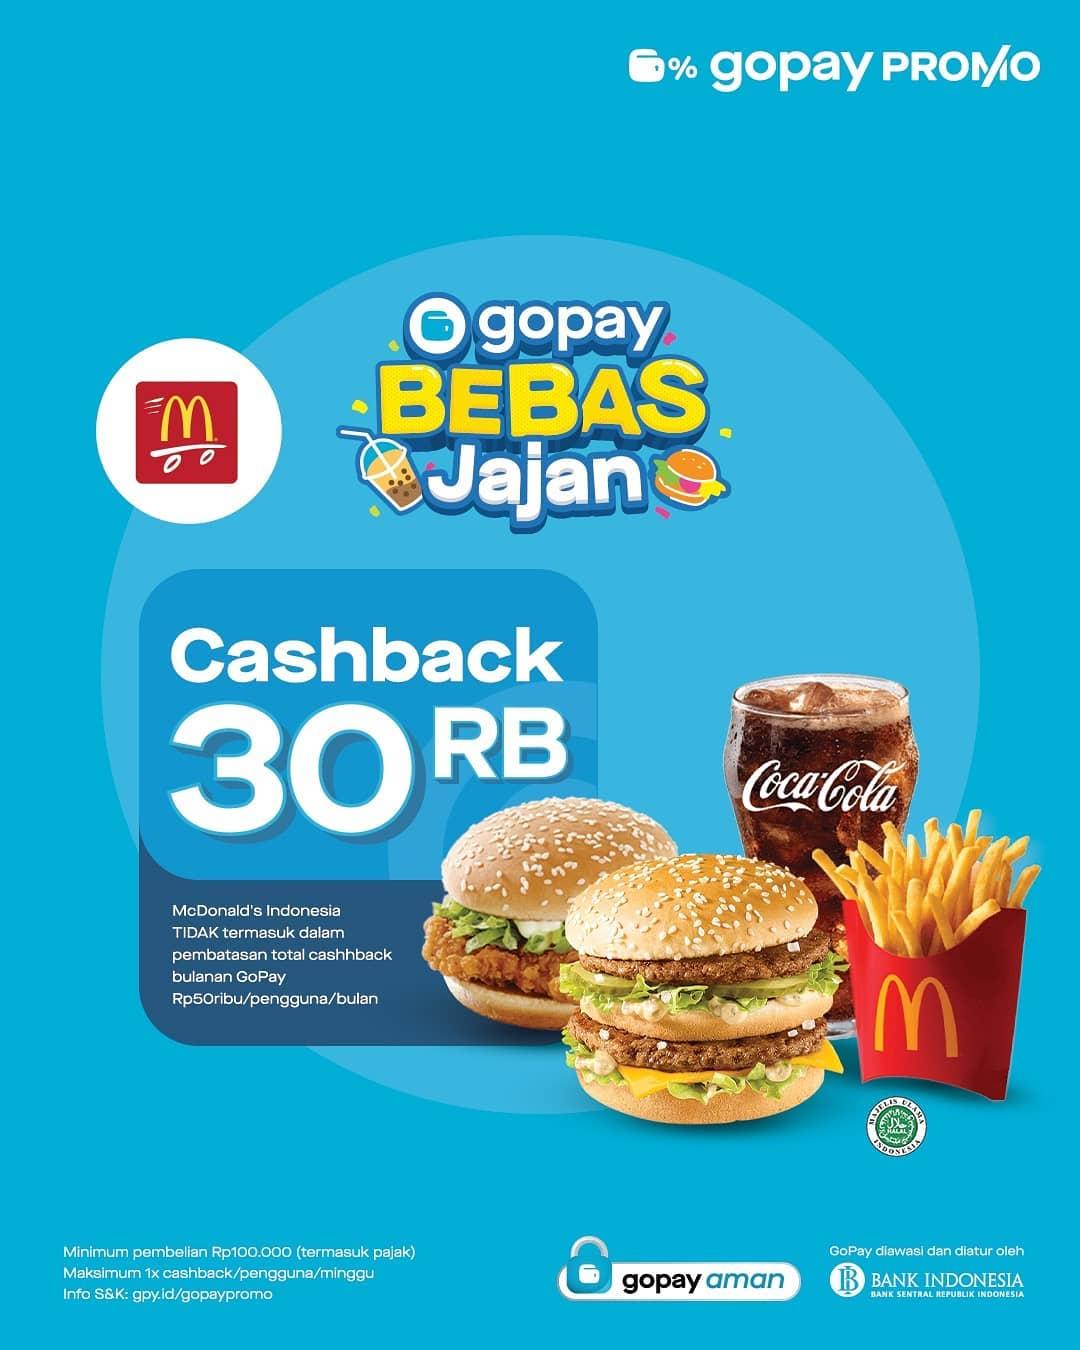 Promo McDonalds CASHBACK Rp. 30.000 khusus pembayaran dengan GOPAY